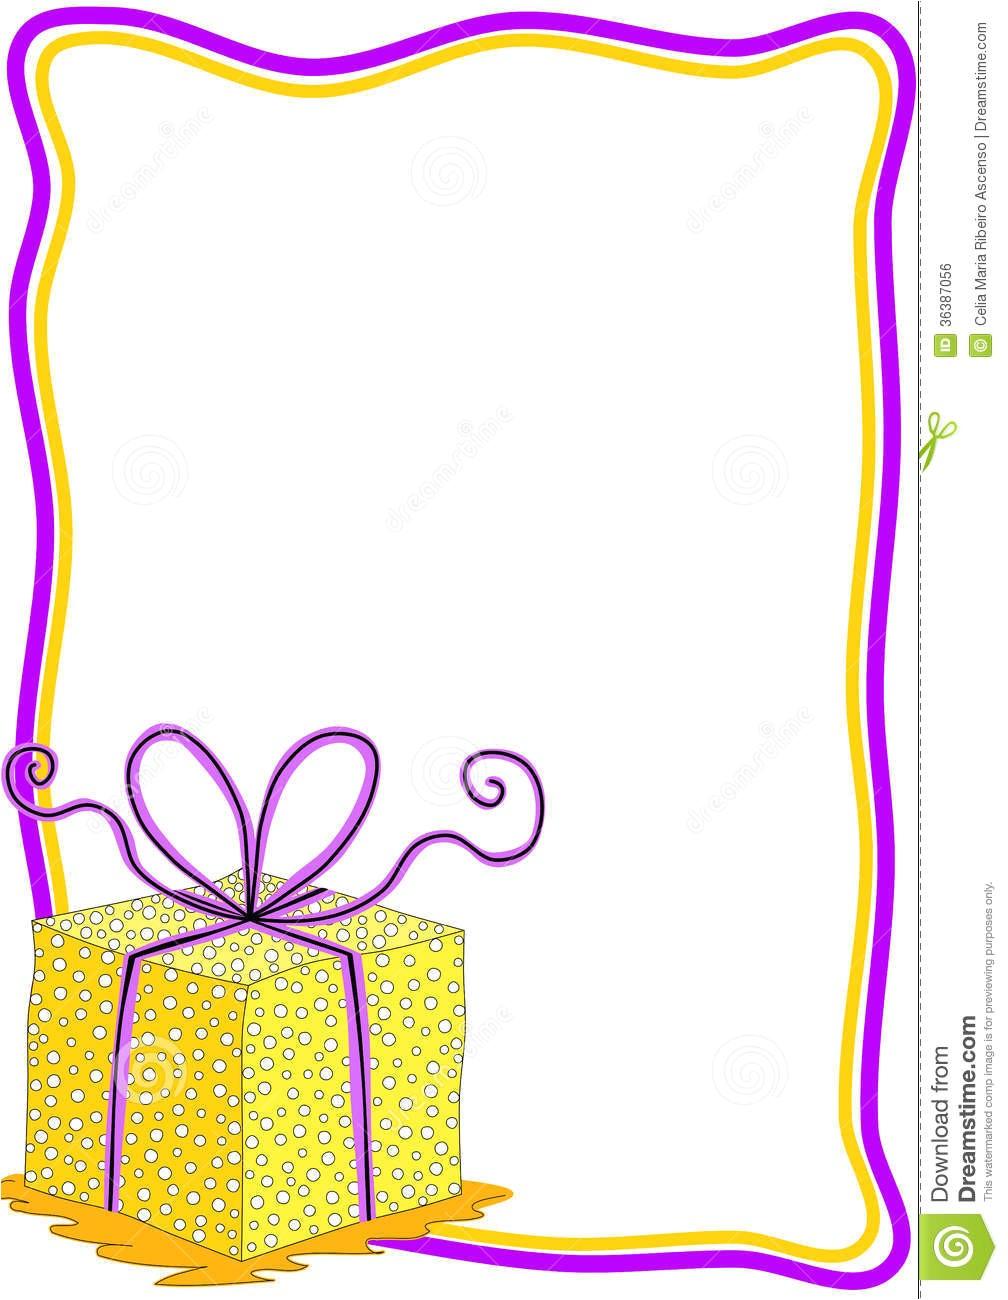 Frames for Birthday Invitation Cards Gift Box Invitation Card with Frame Stock Illustration